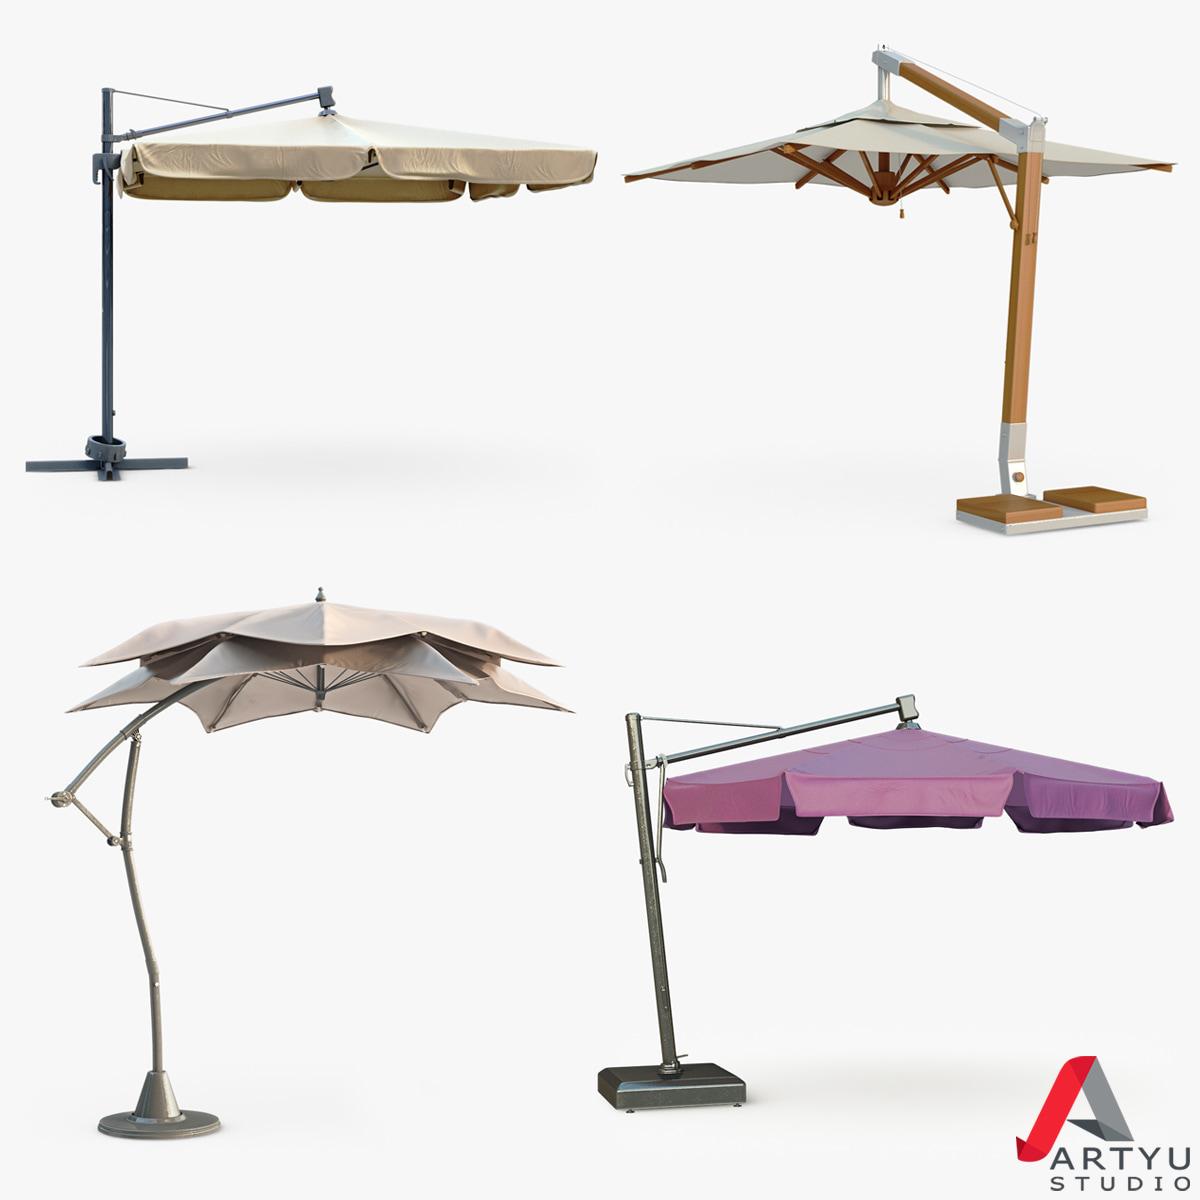 Patio Umbrella Set_basic.jpg